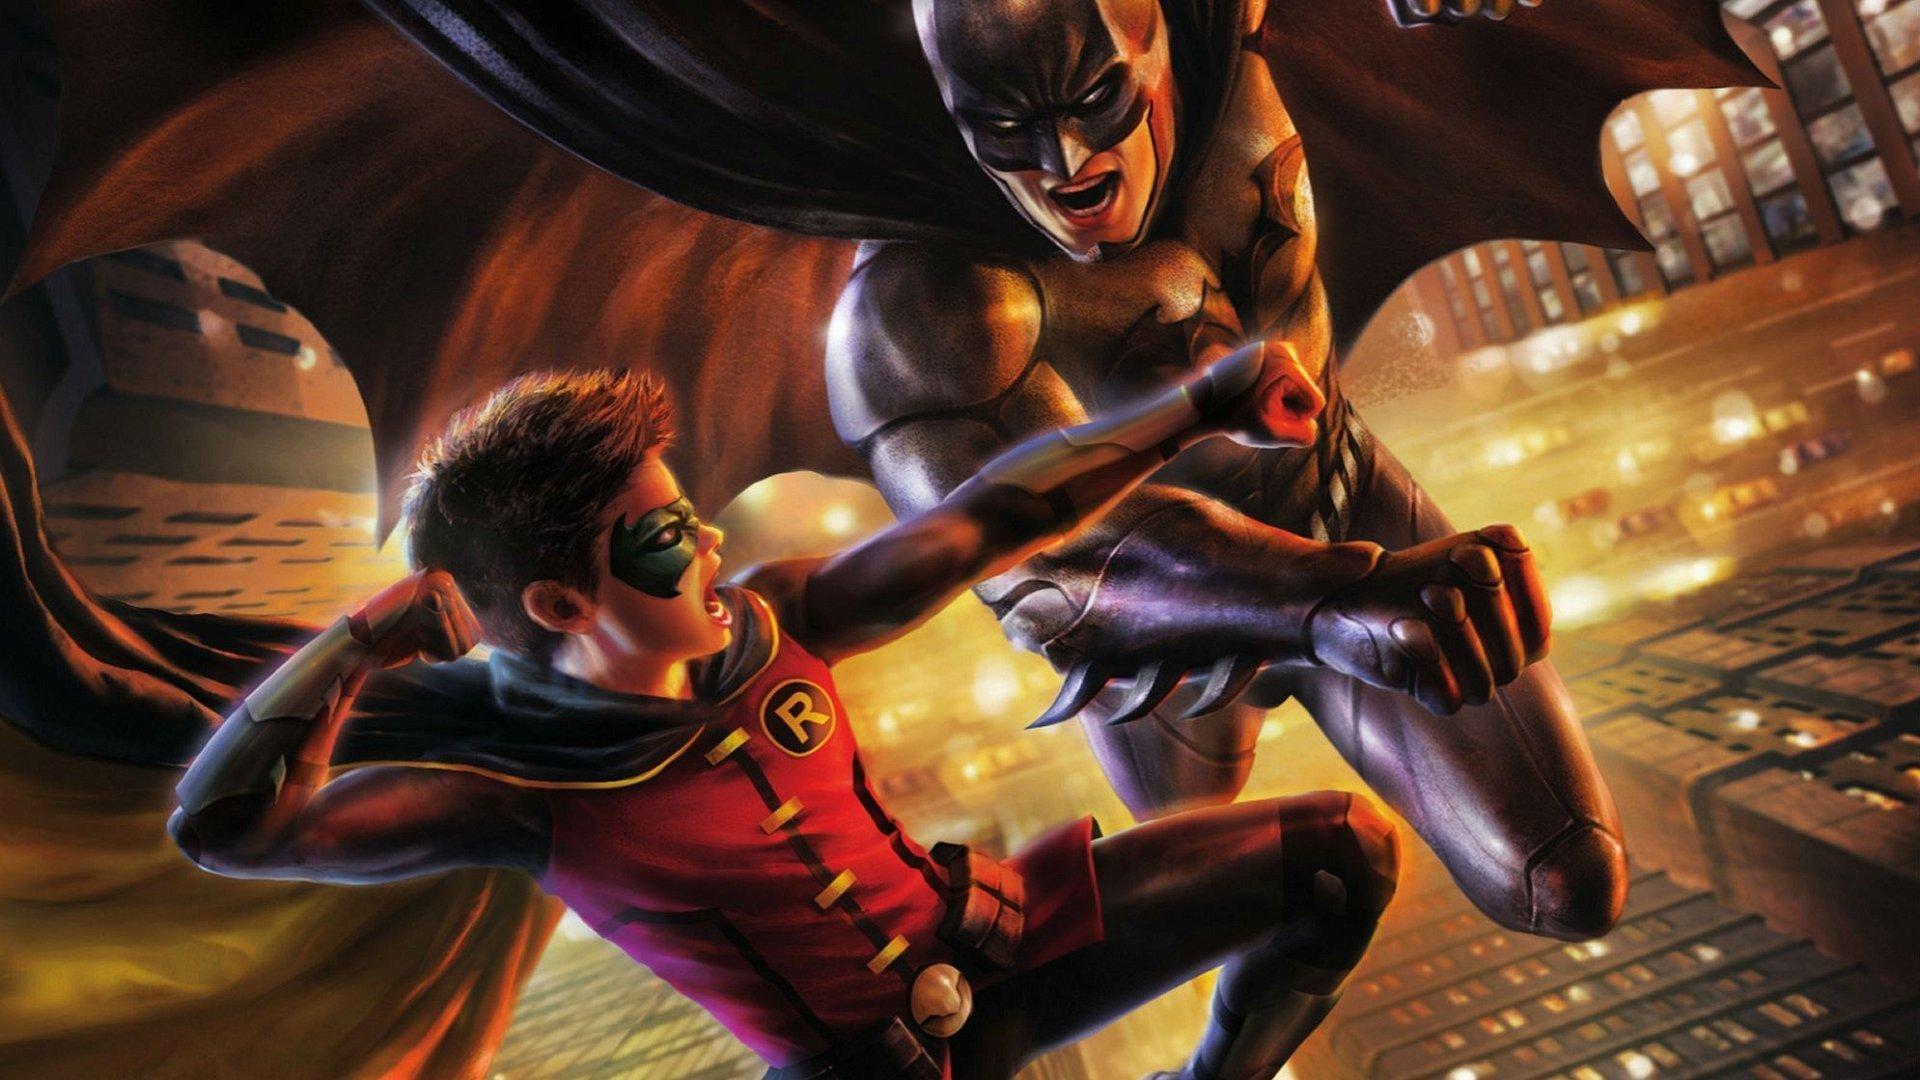 Movie Batman Vs Robin 1920x1080